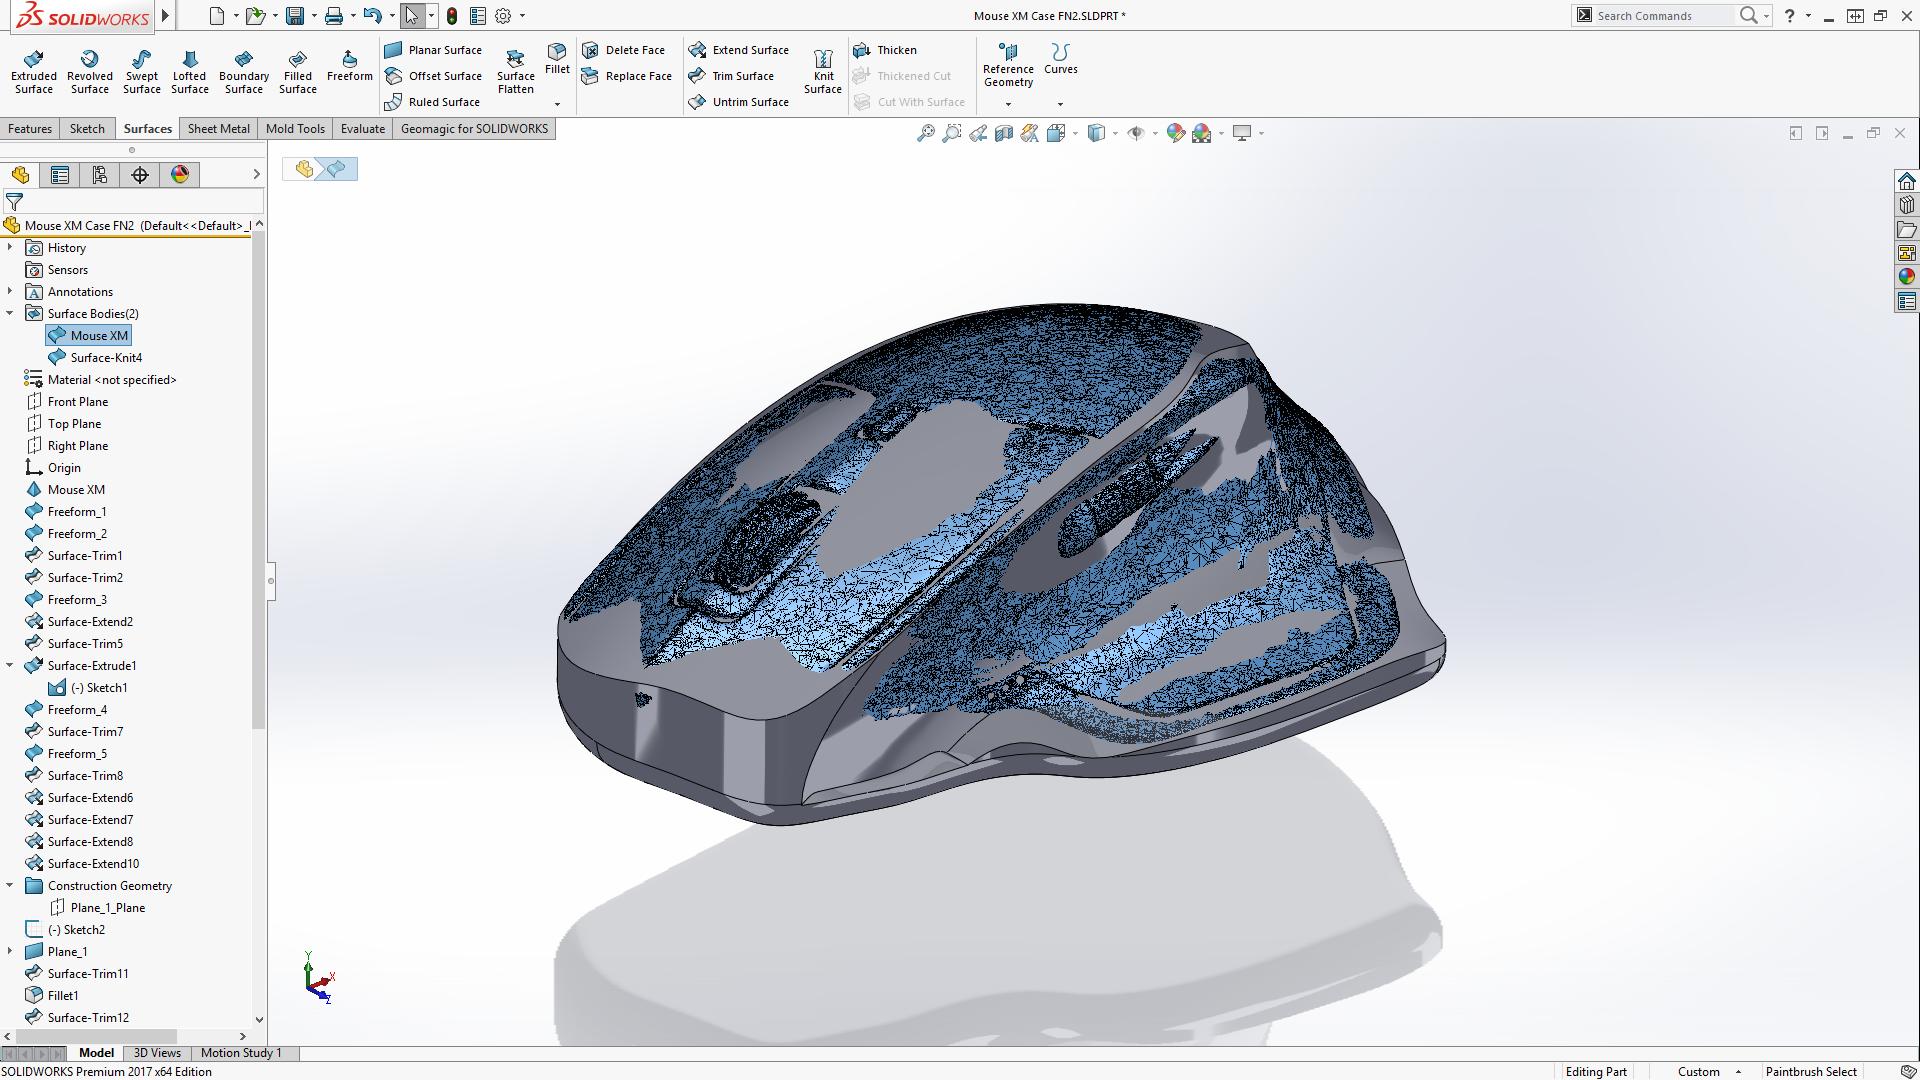 Final surface profile